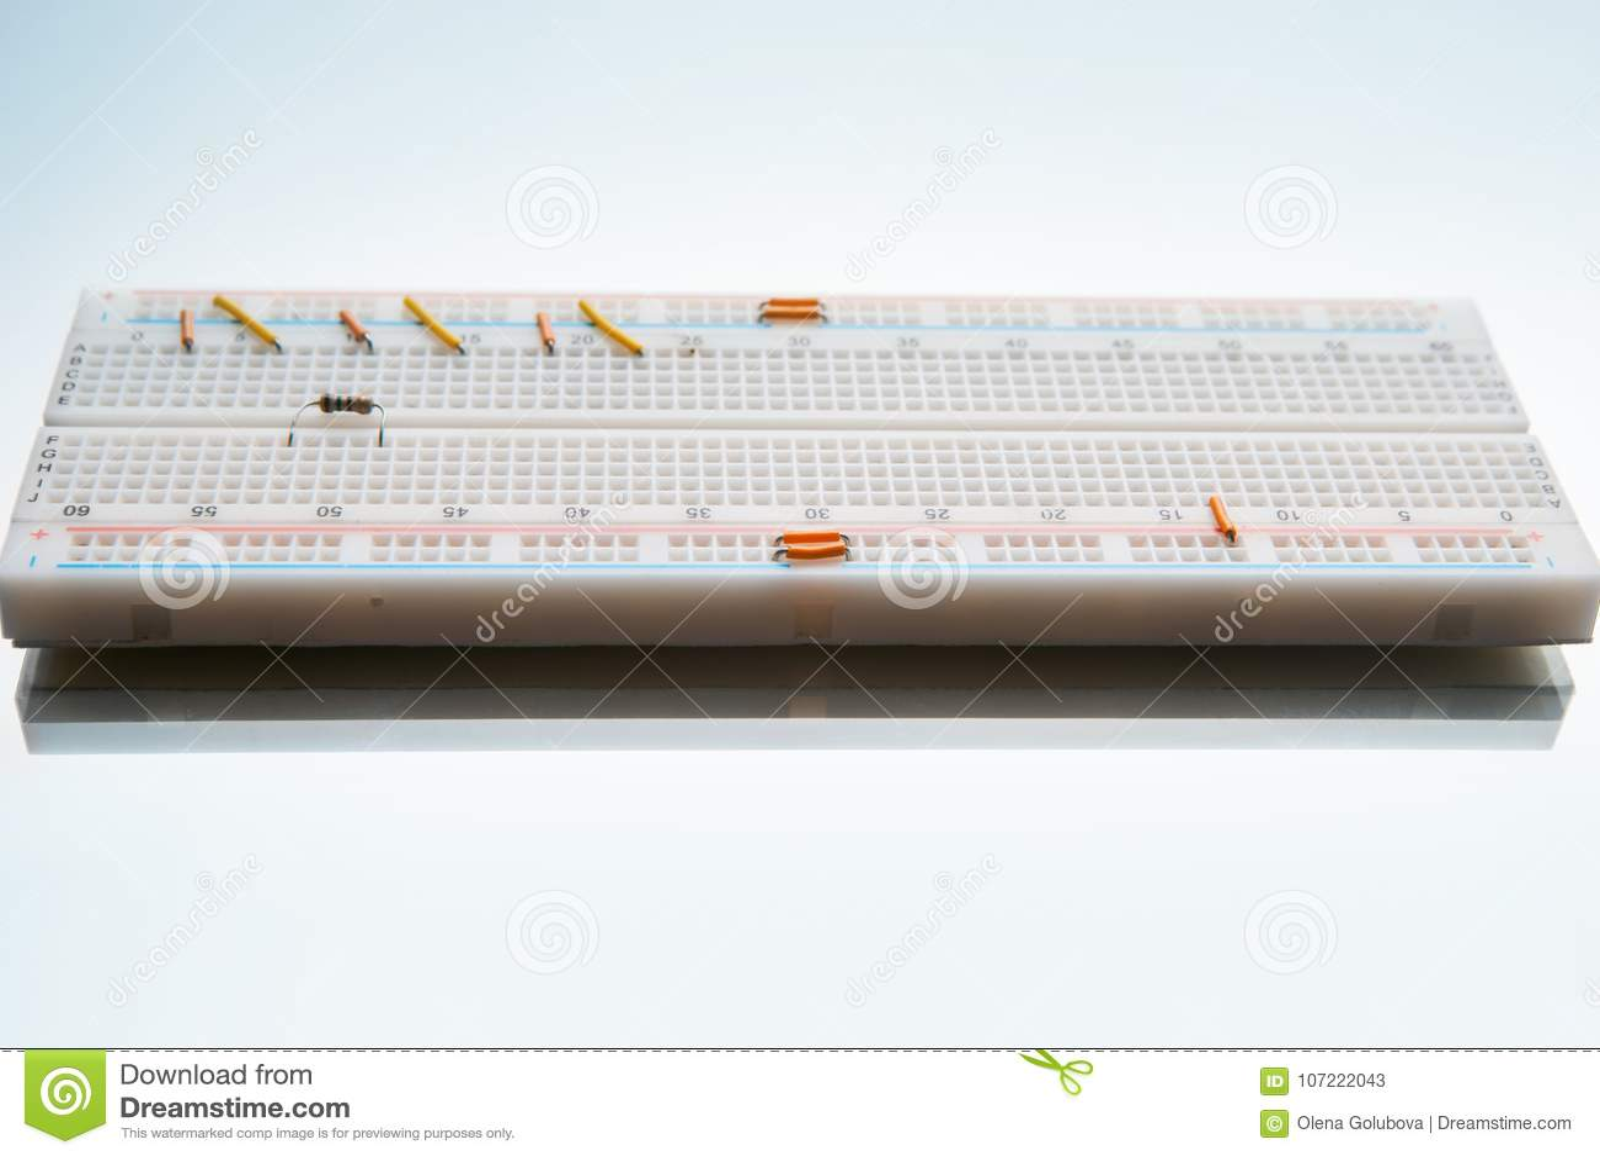 Solderless Circuit Breadboard Electronics Design Stock Image Schematic Diagram Supply